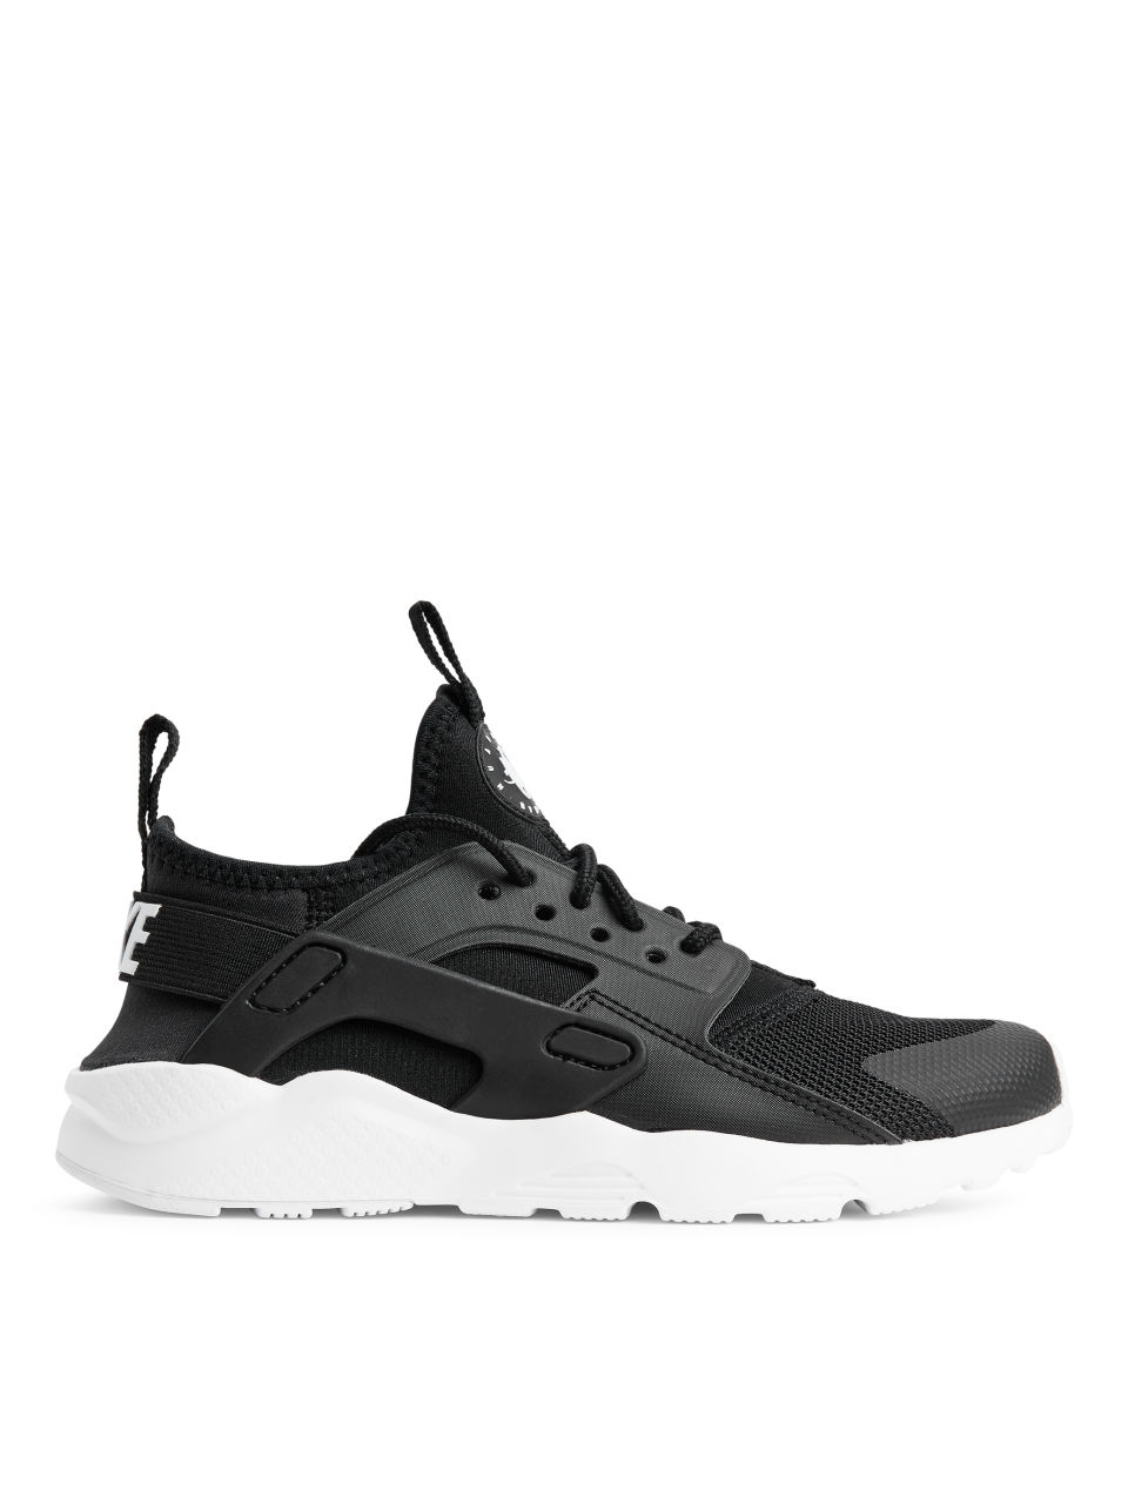 7f5f521cc64b Nike Huarache Run Ultra - Black